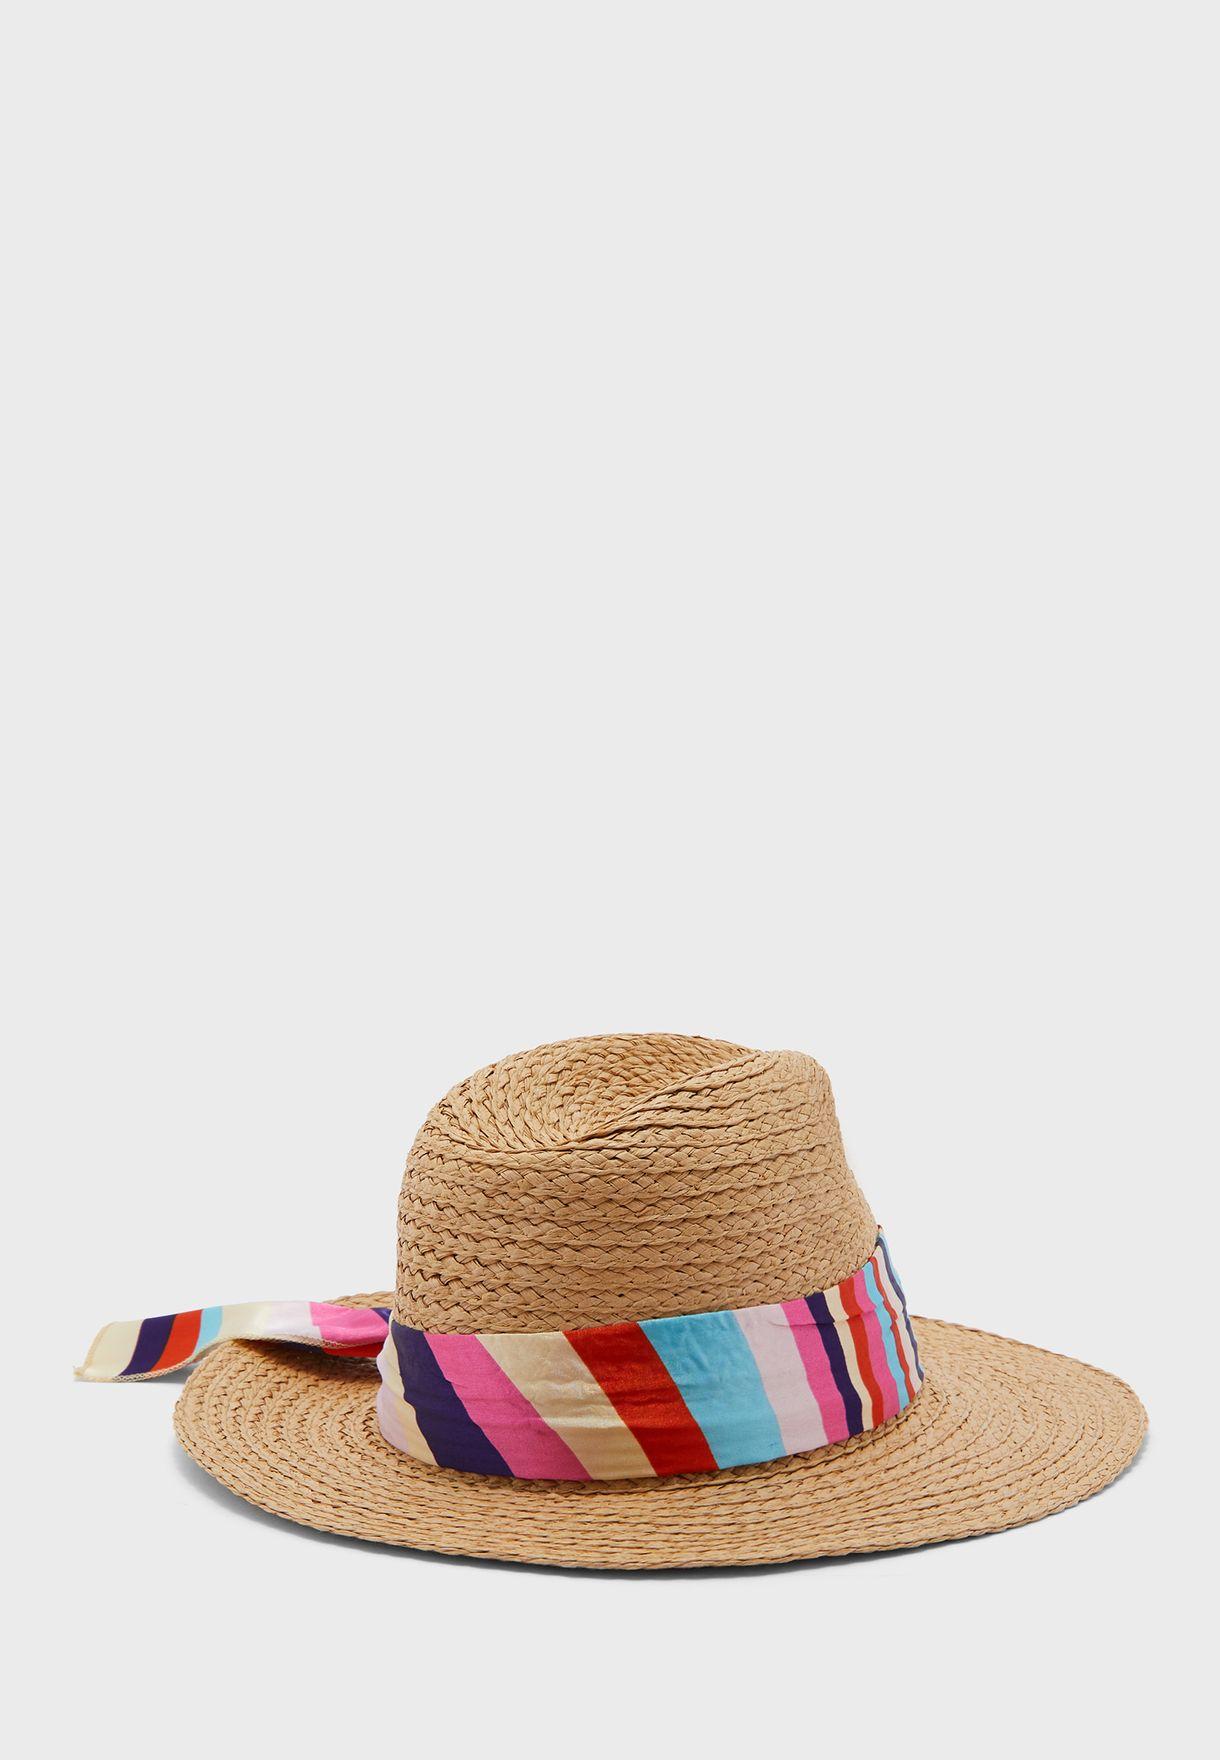 قبعة قش بوشاح